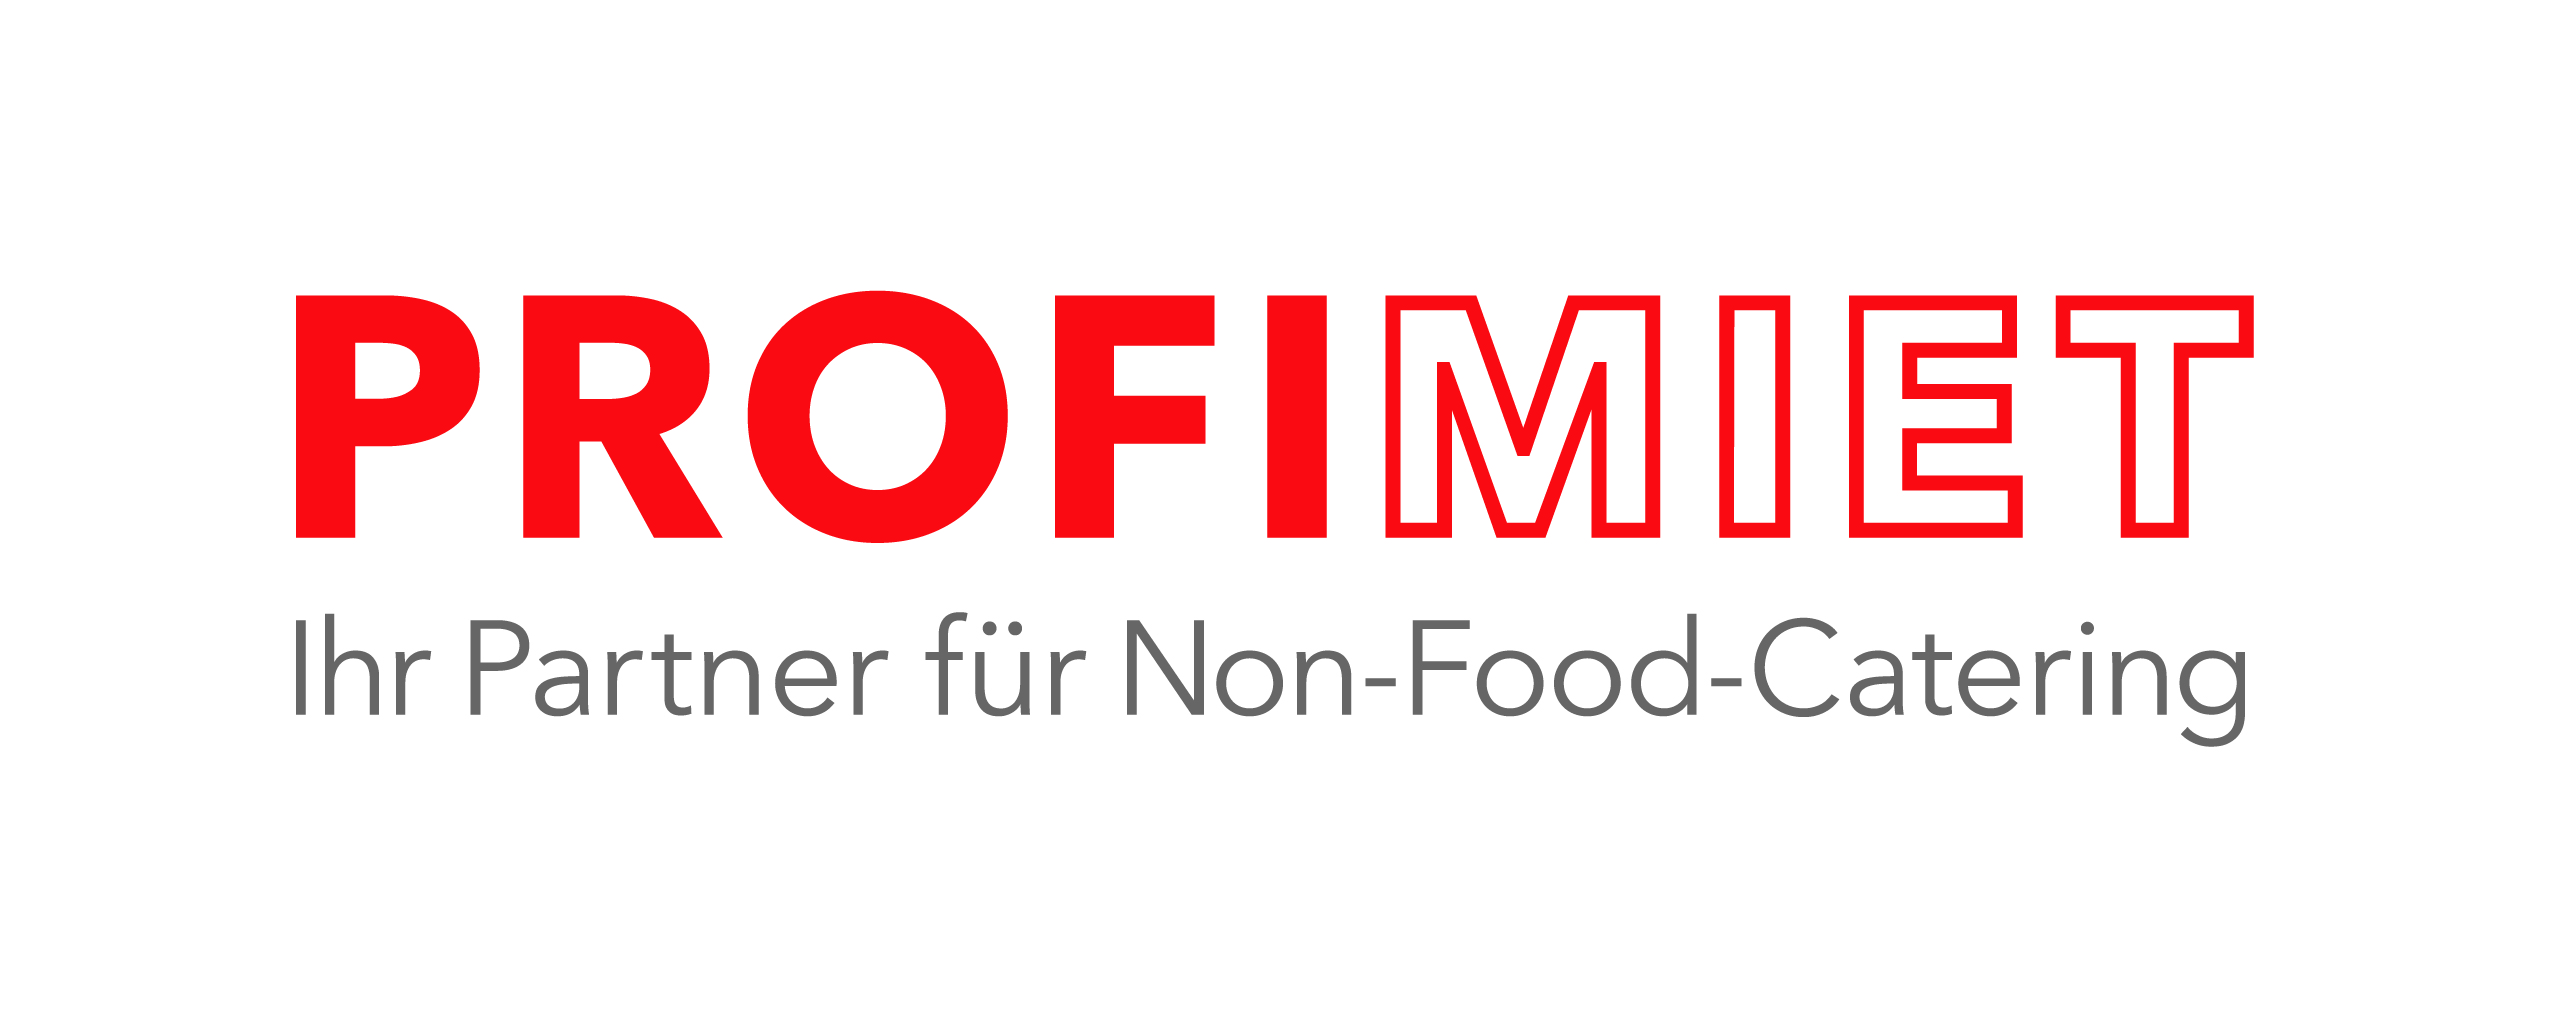 profimiet-logo-mit-claim-cmyk-farbig